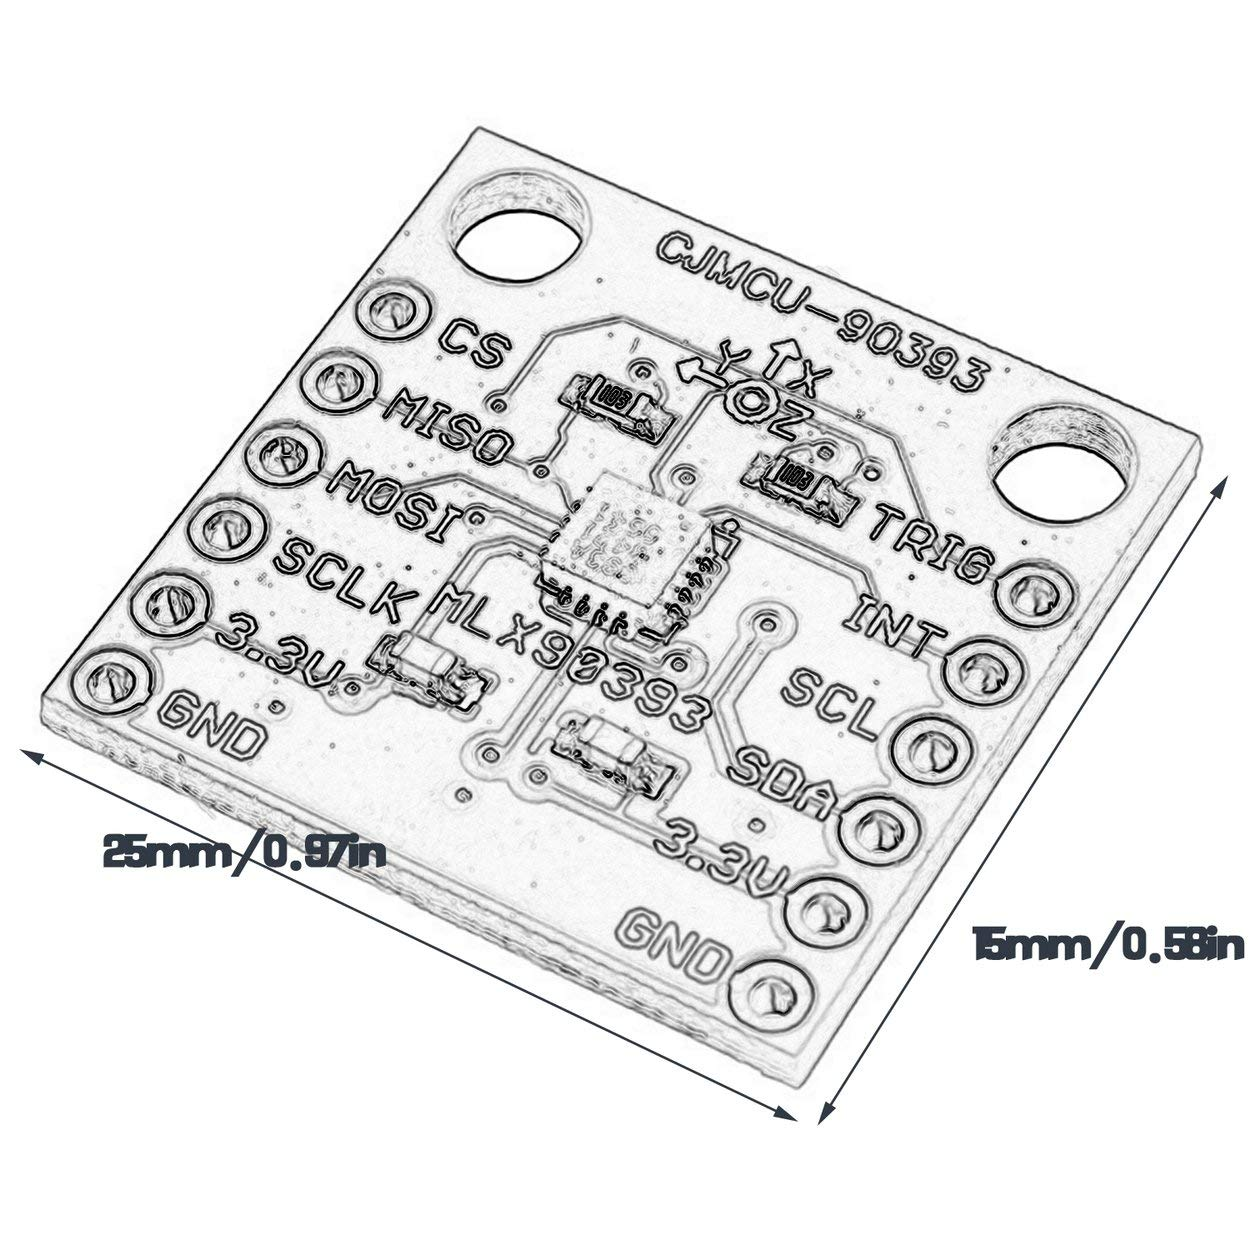 anyilon Cjmcu-90393 Mlx90393 Digital 3D Hall Sensor Displacement Angle Rotate 3D